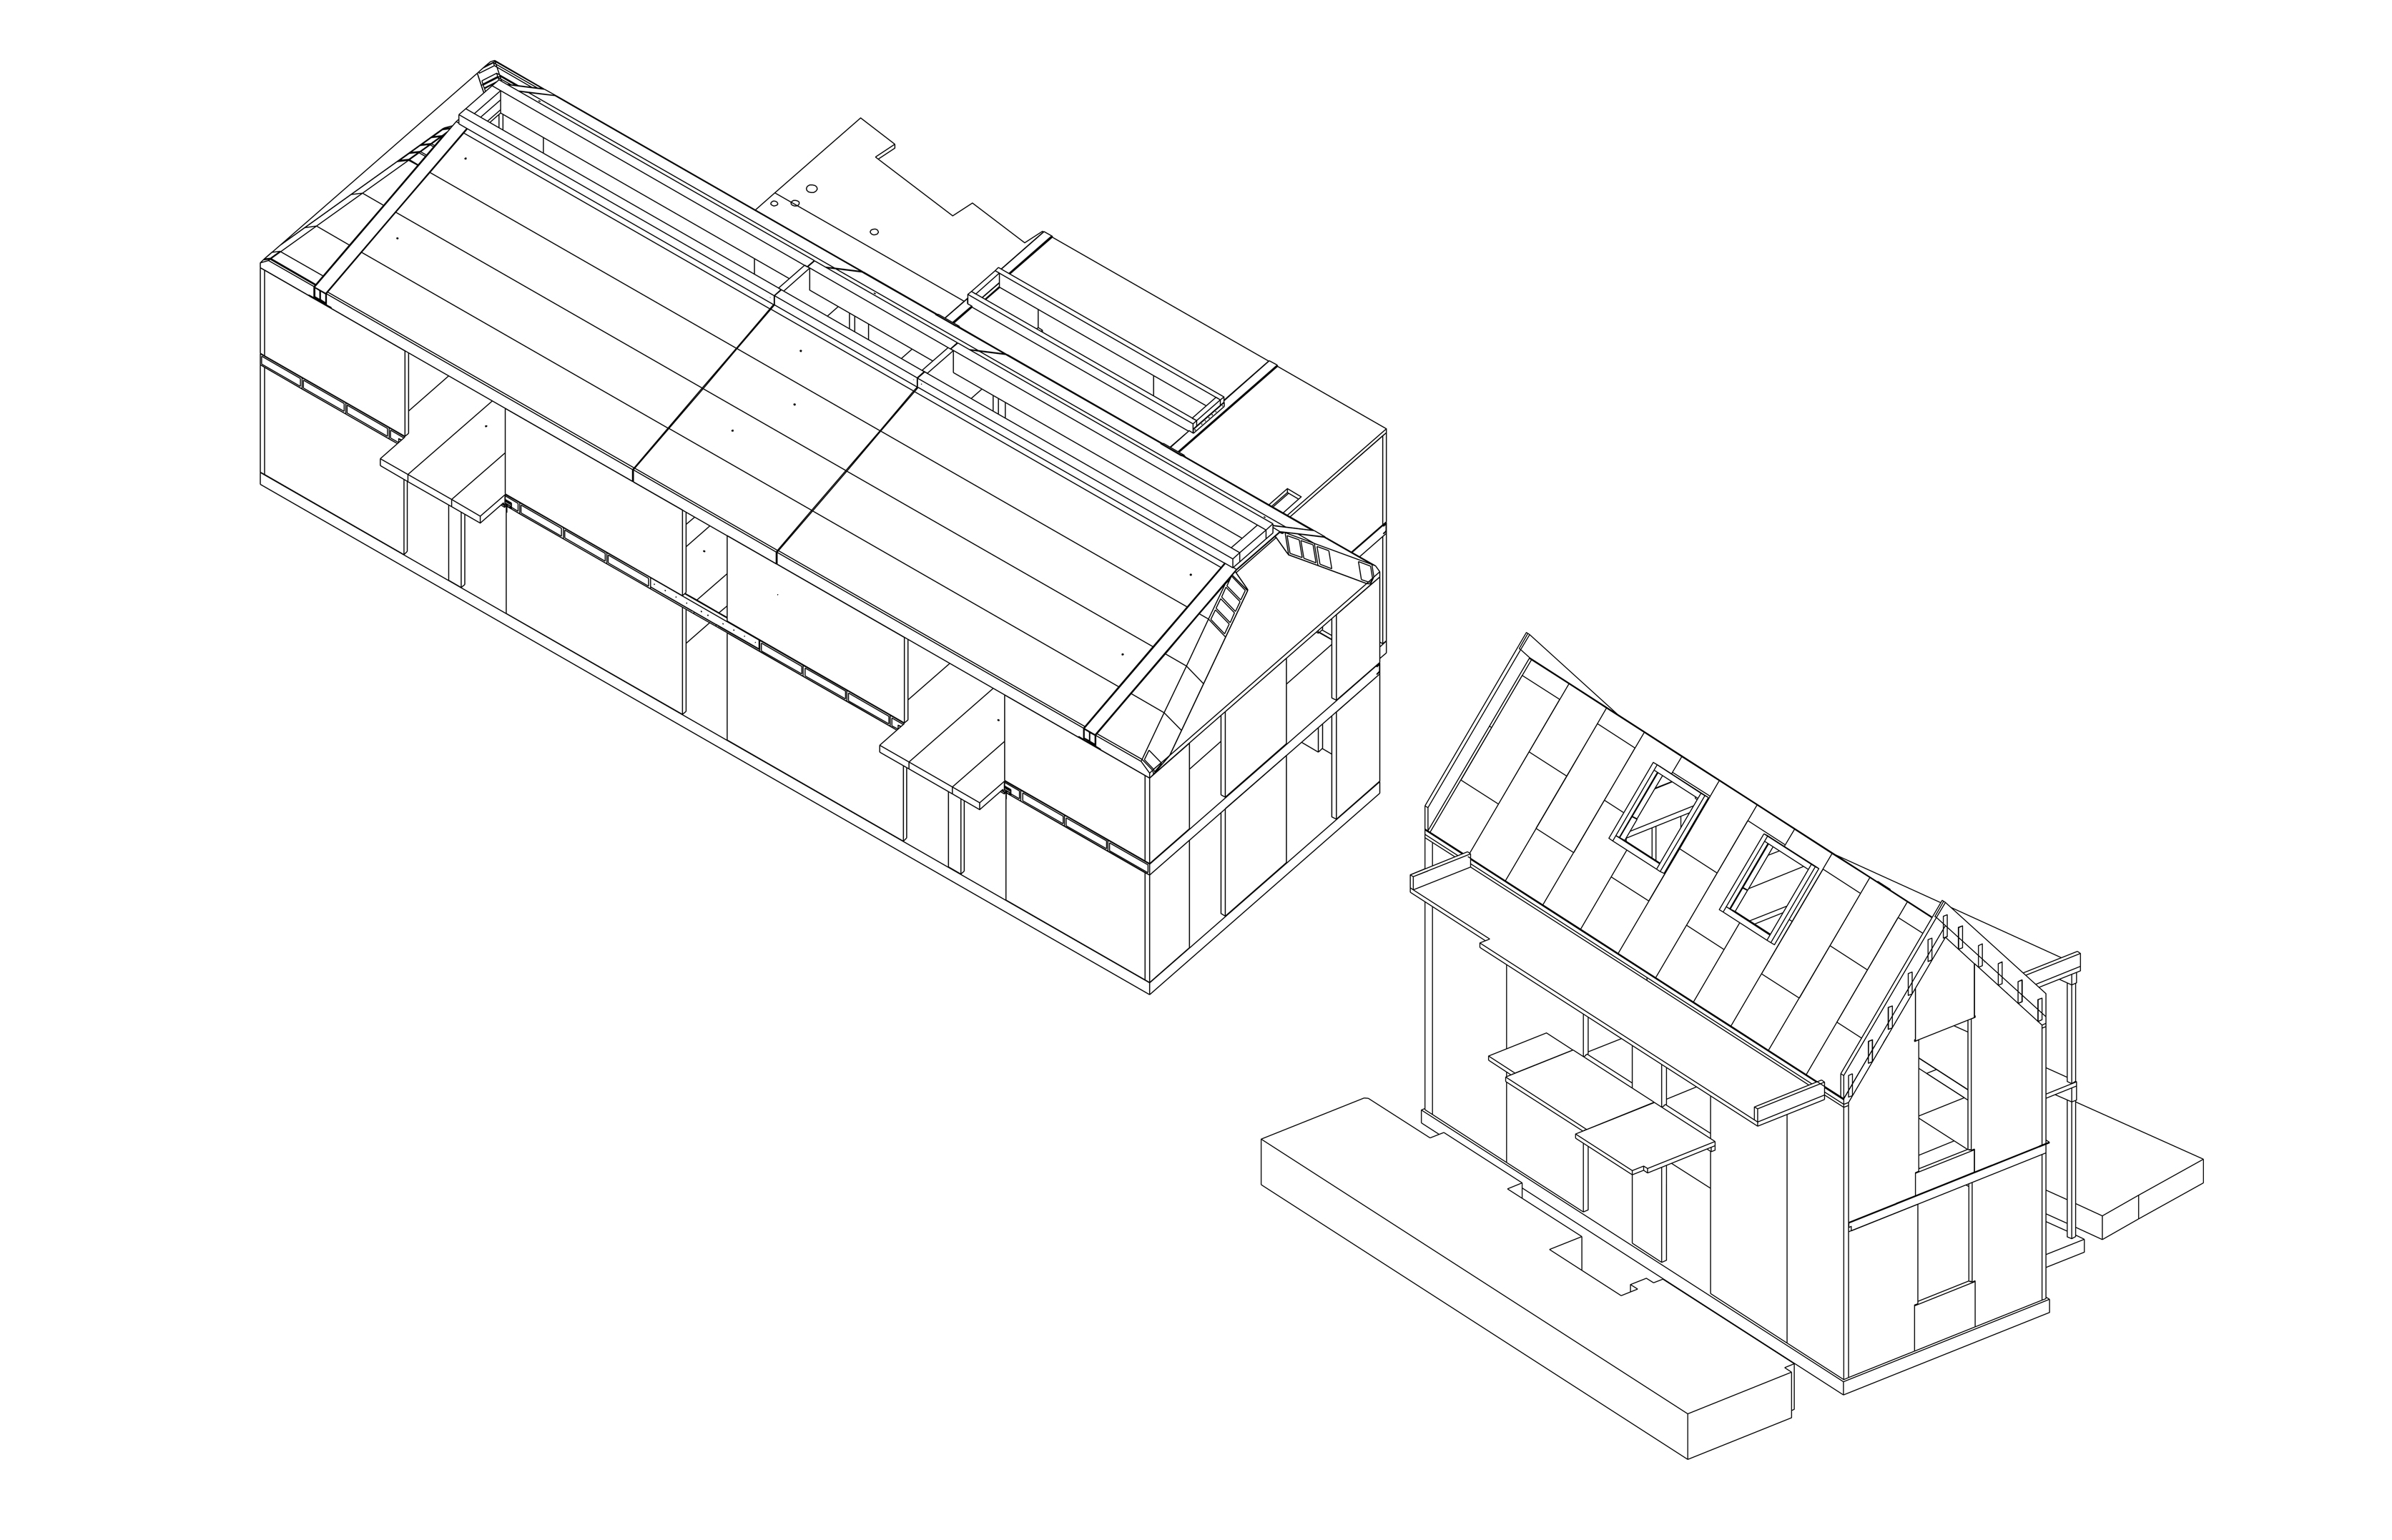 Tonbridge School - Projects - Eurban